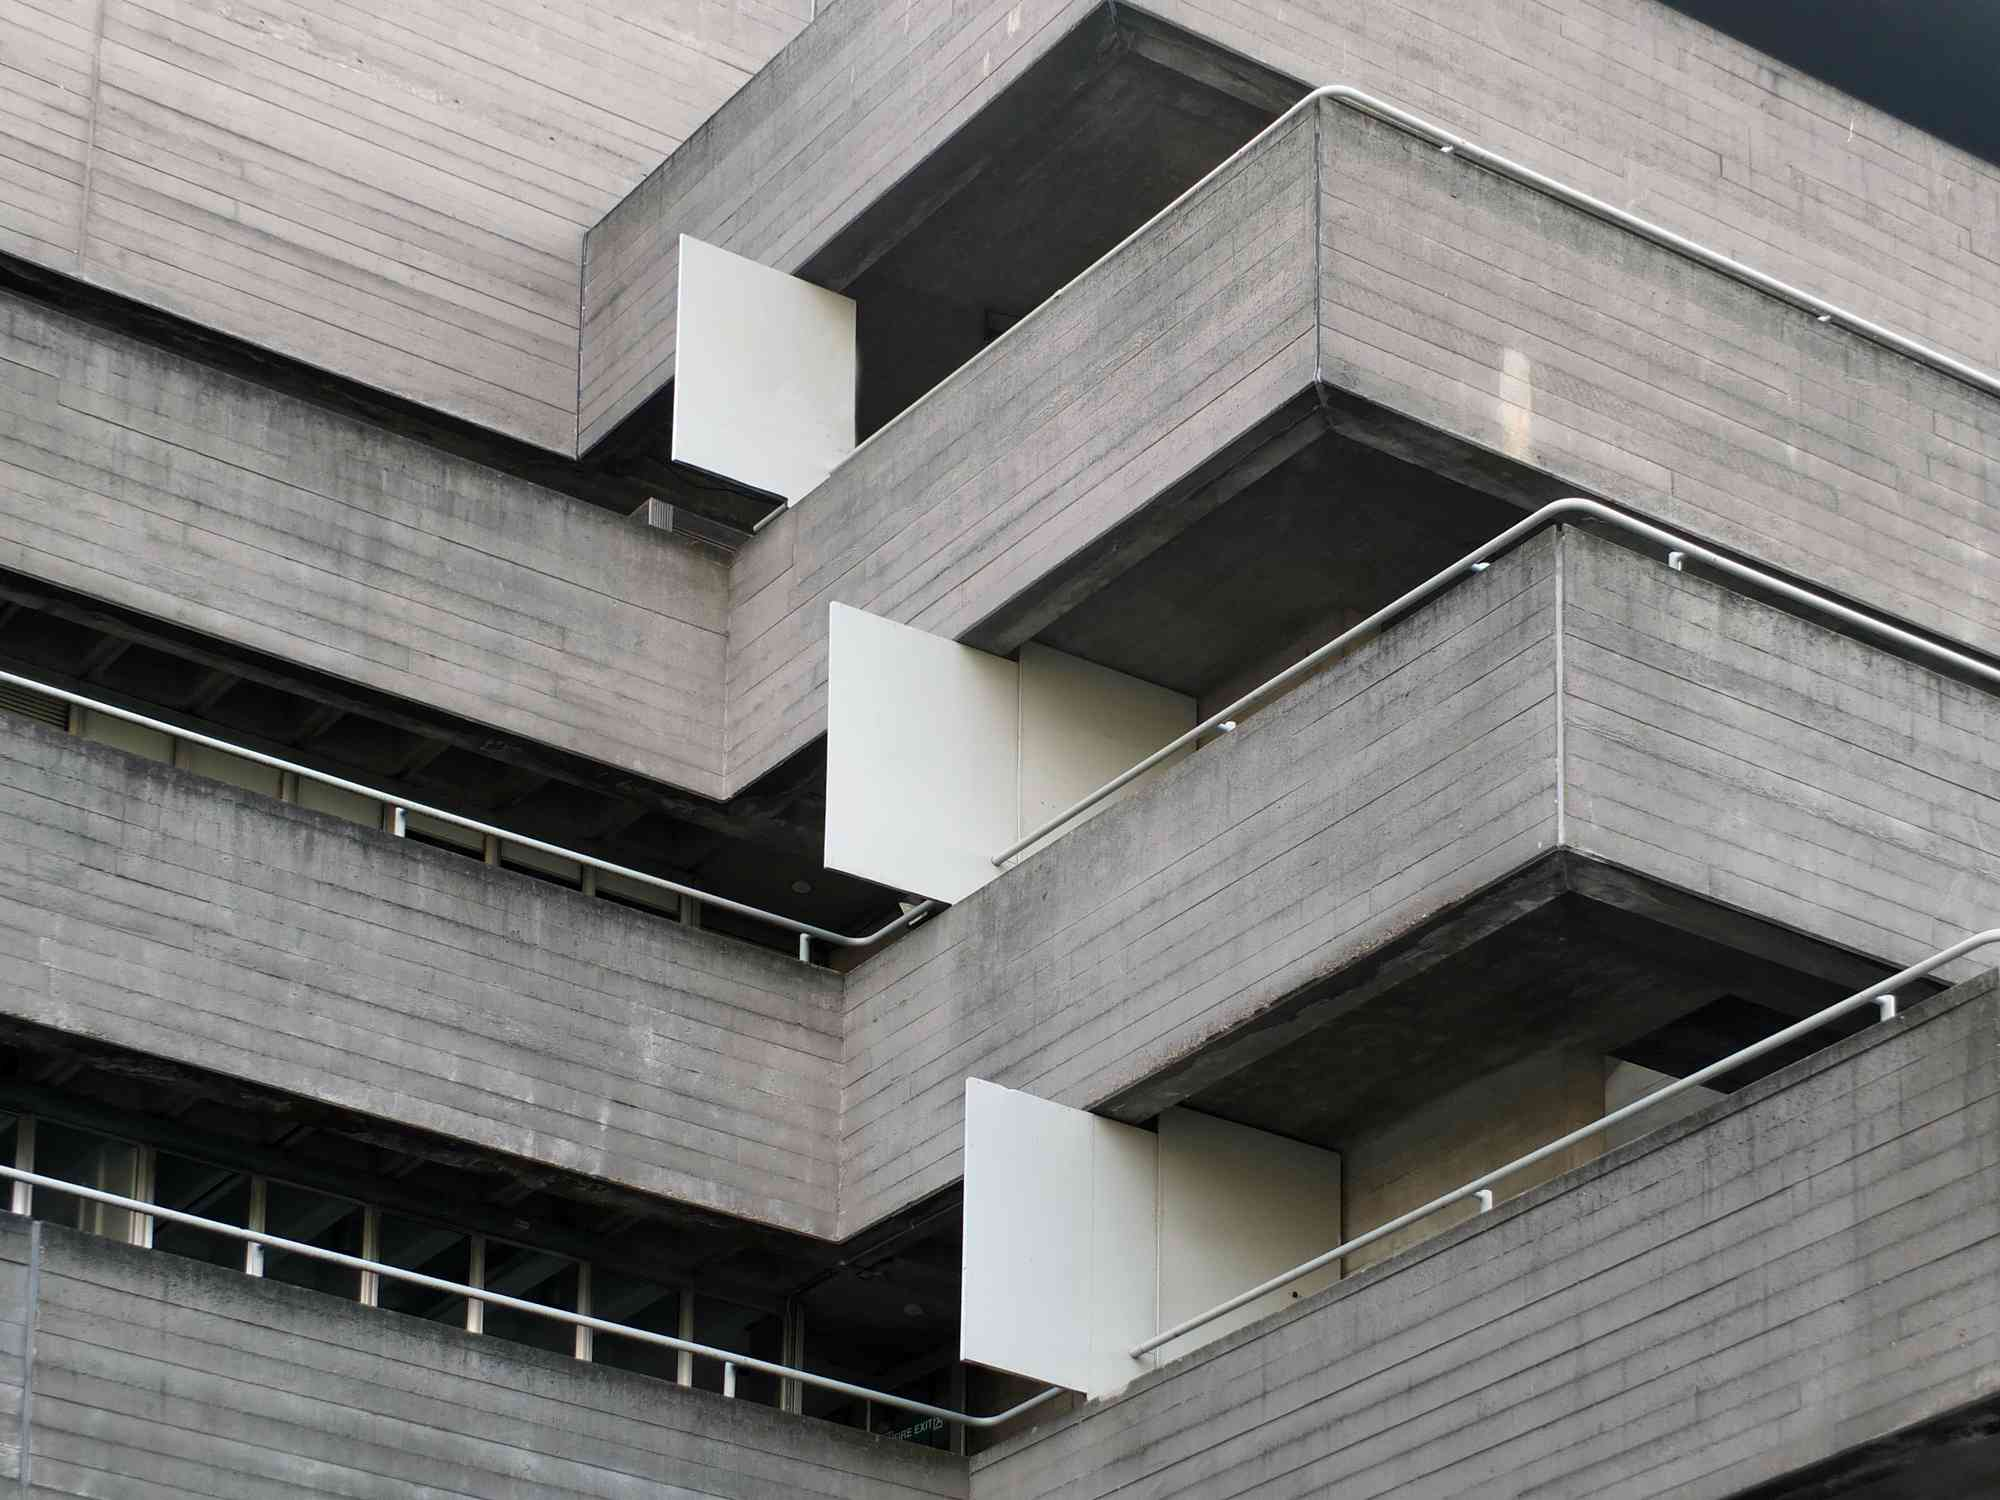 Railings and balconies of old Brutalist building